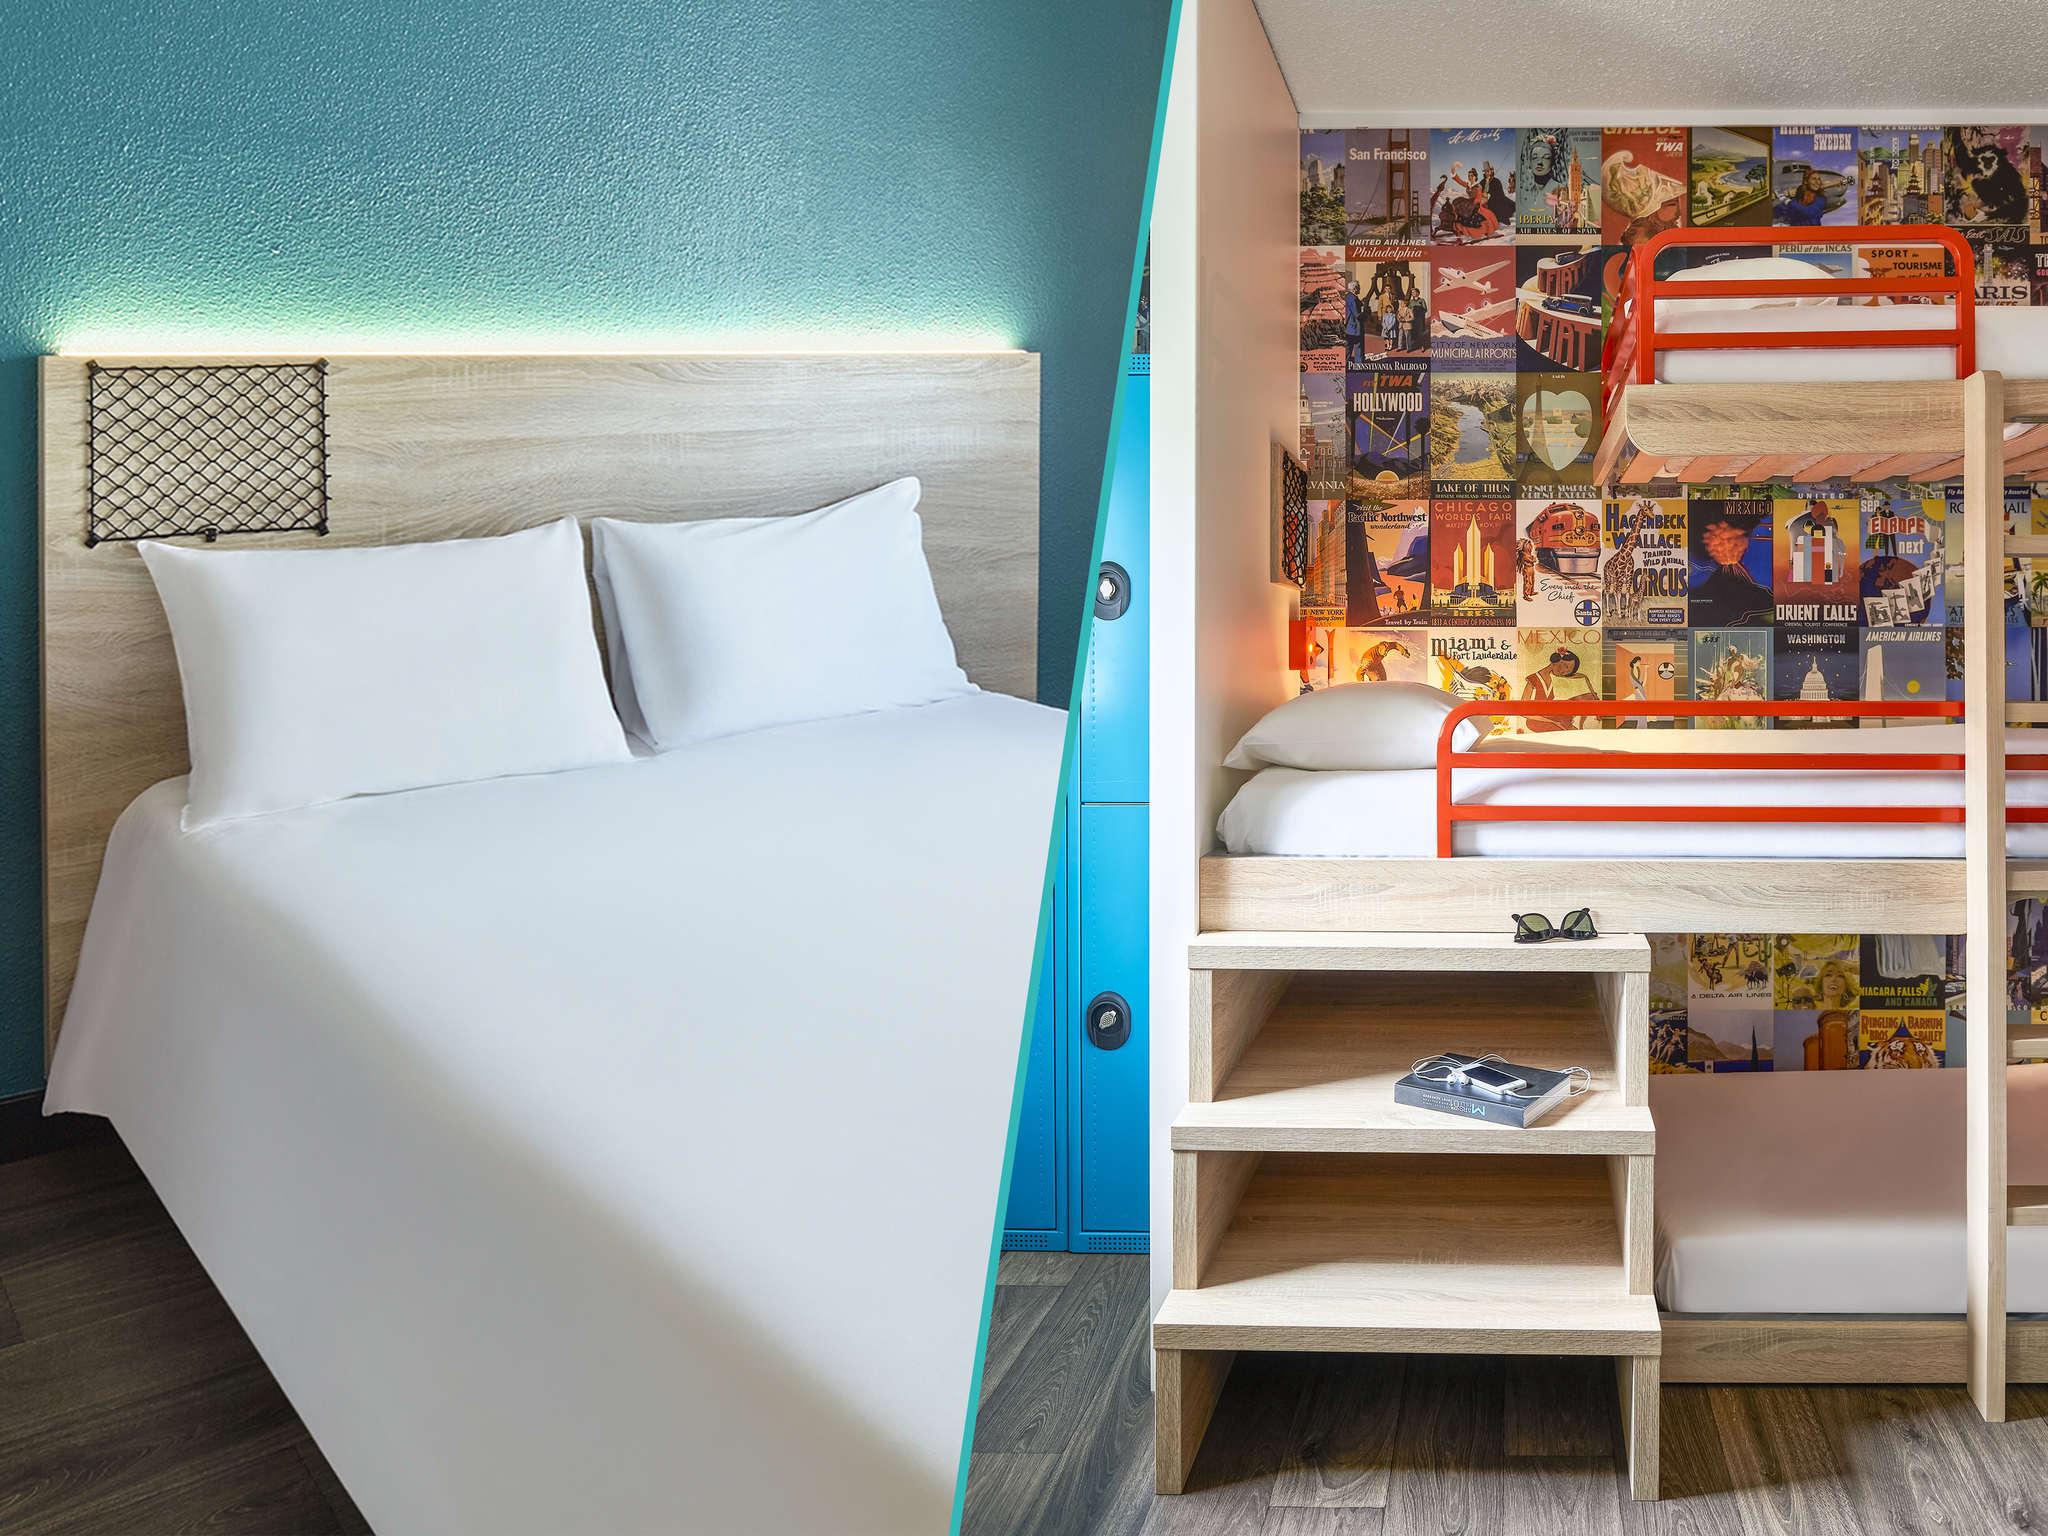 ホテル – hotelF1 Paris Porte de Châtillon